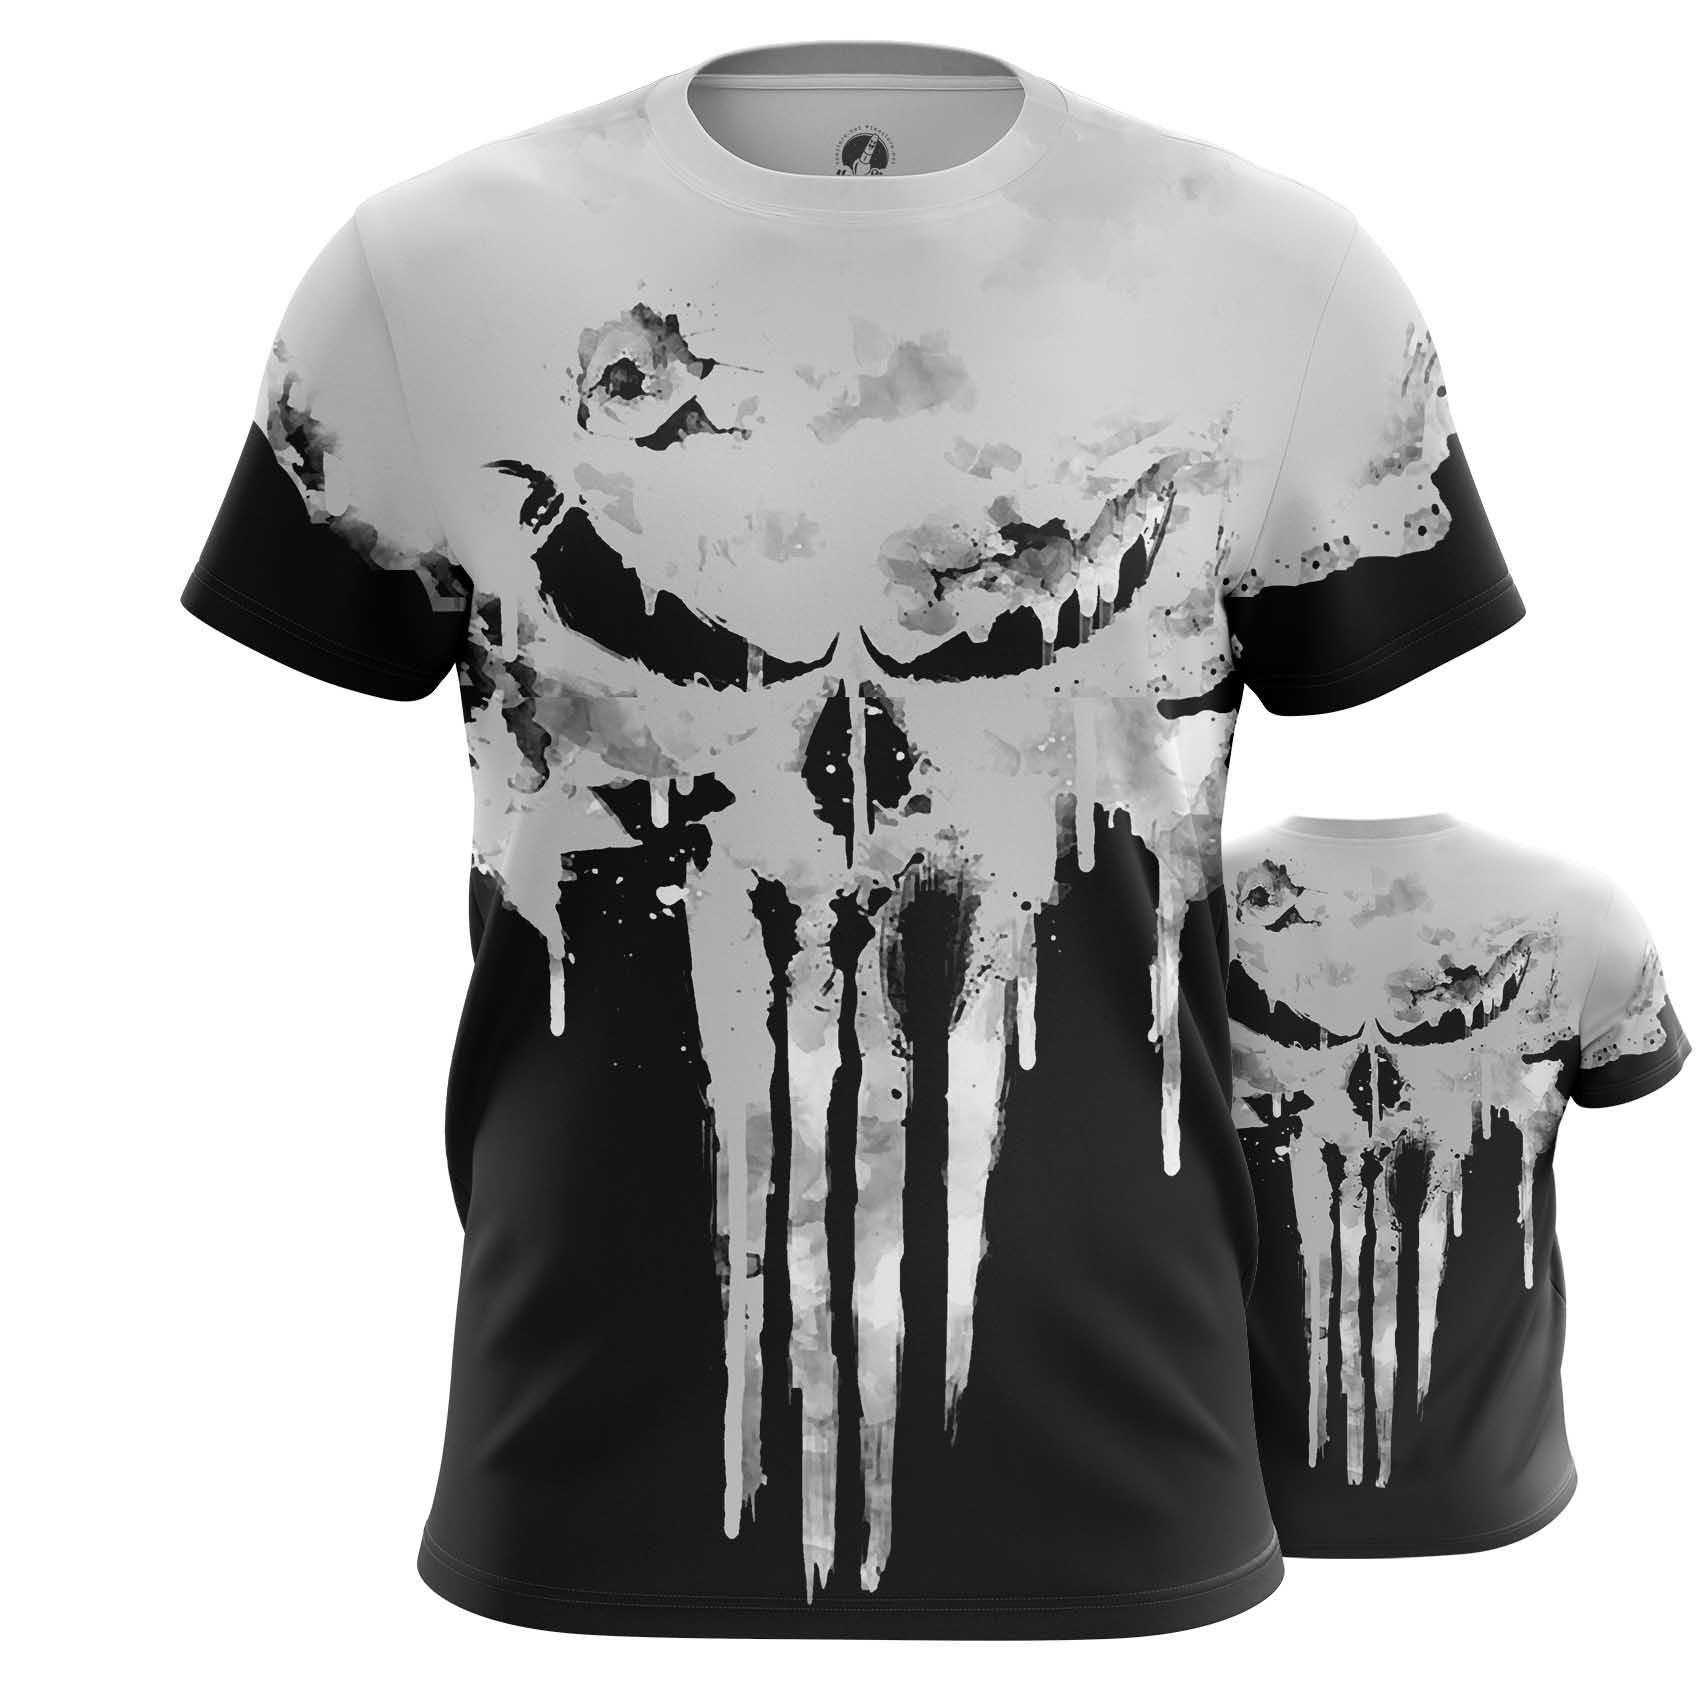 Collectibles T-Shirt Punisher Skull Logo Full Body Print Inspired Clothing